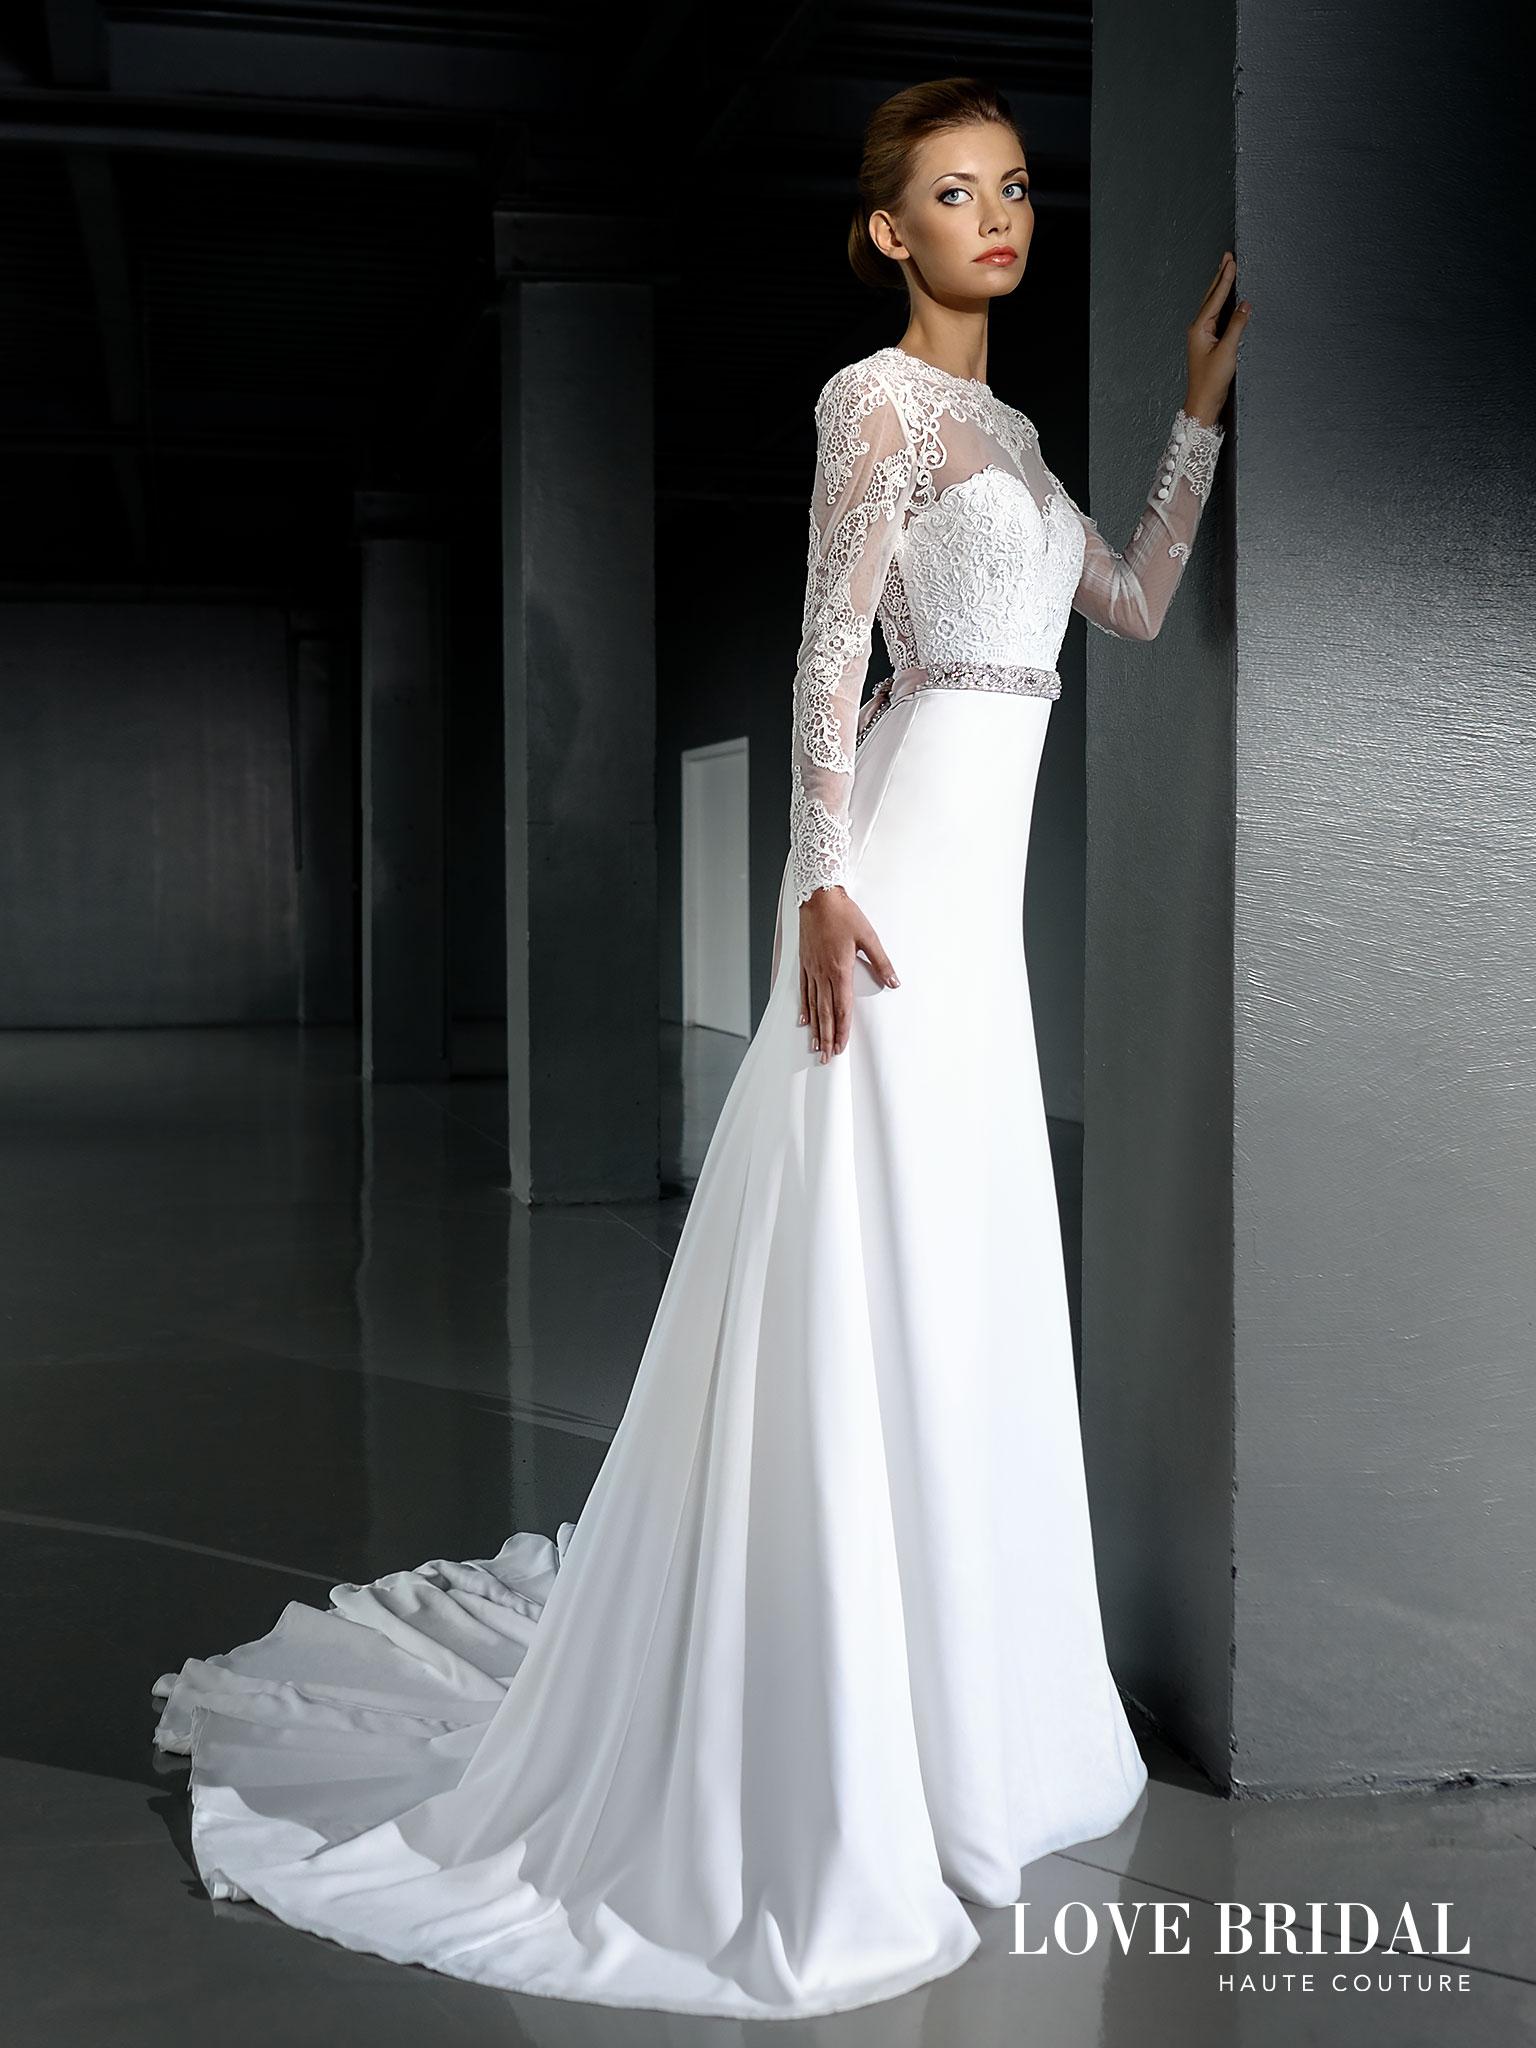 042bd480a2e Купить кружевное свадебное платье а-силуэта Love Bridal арт.14212